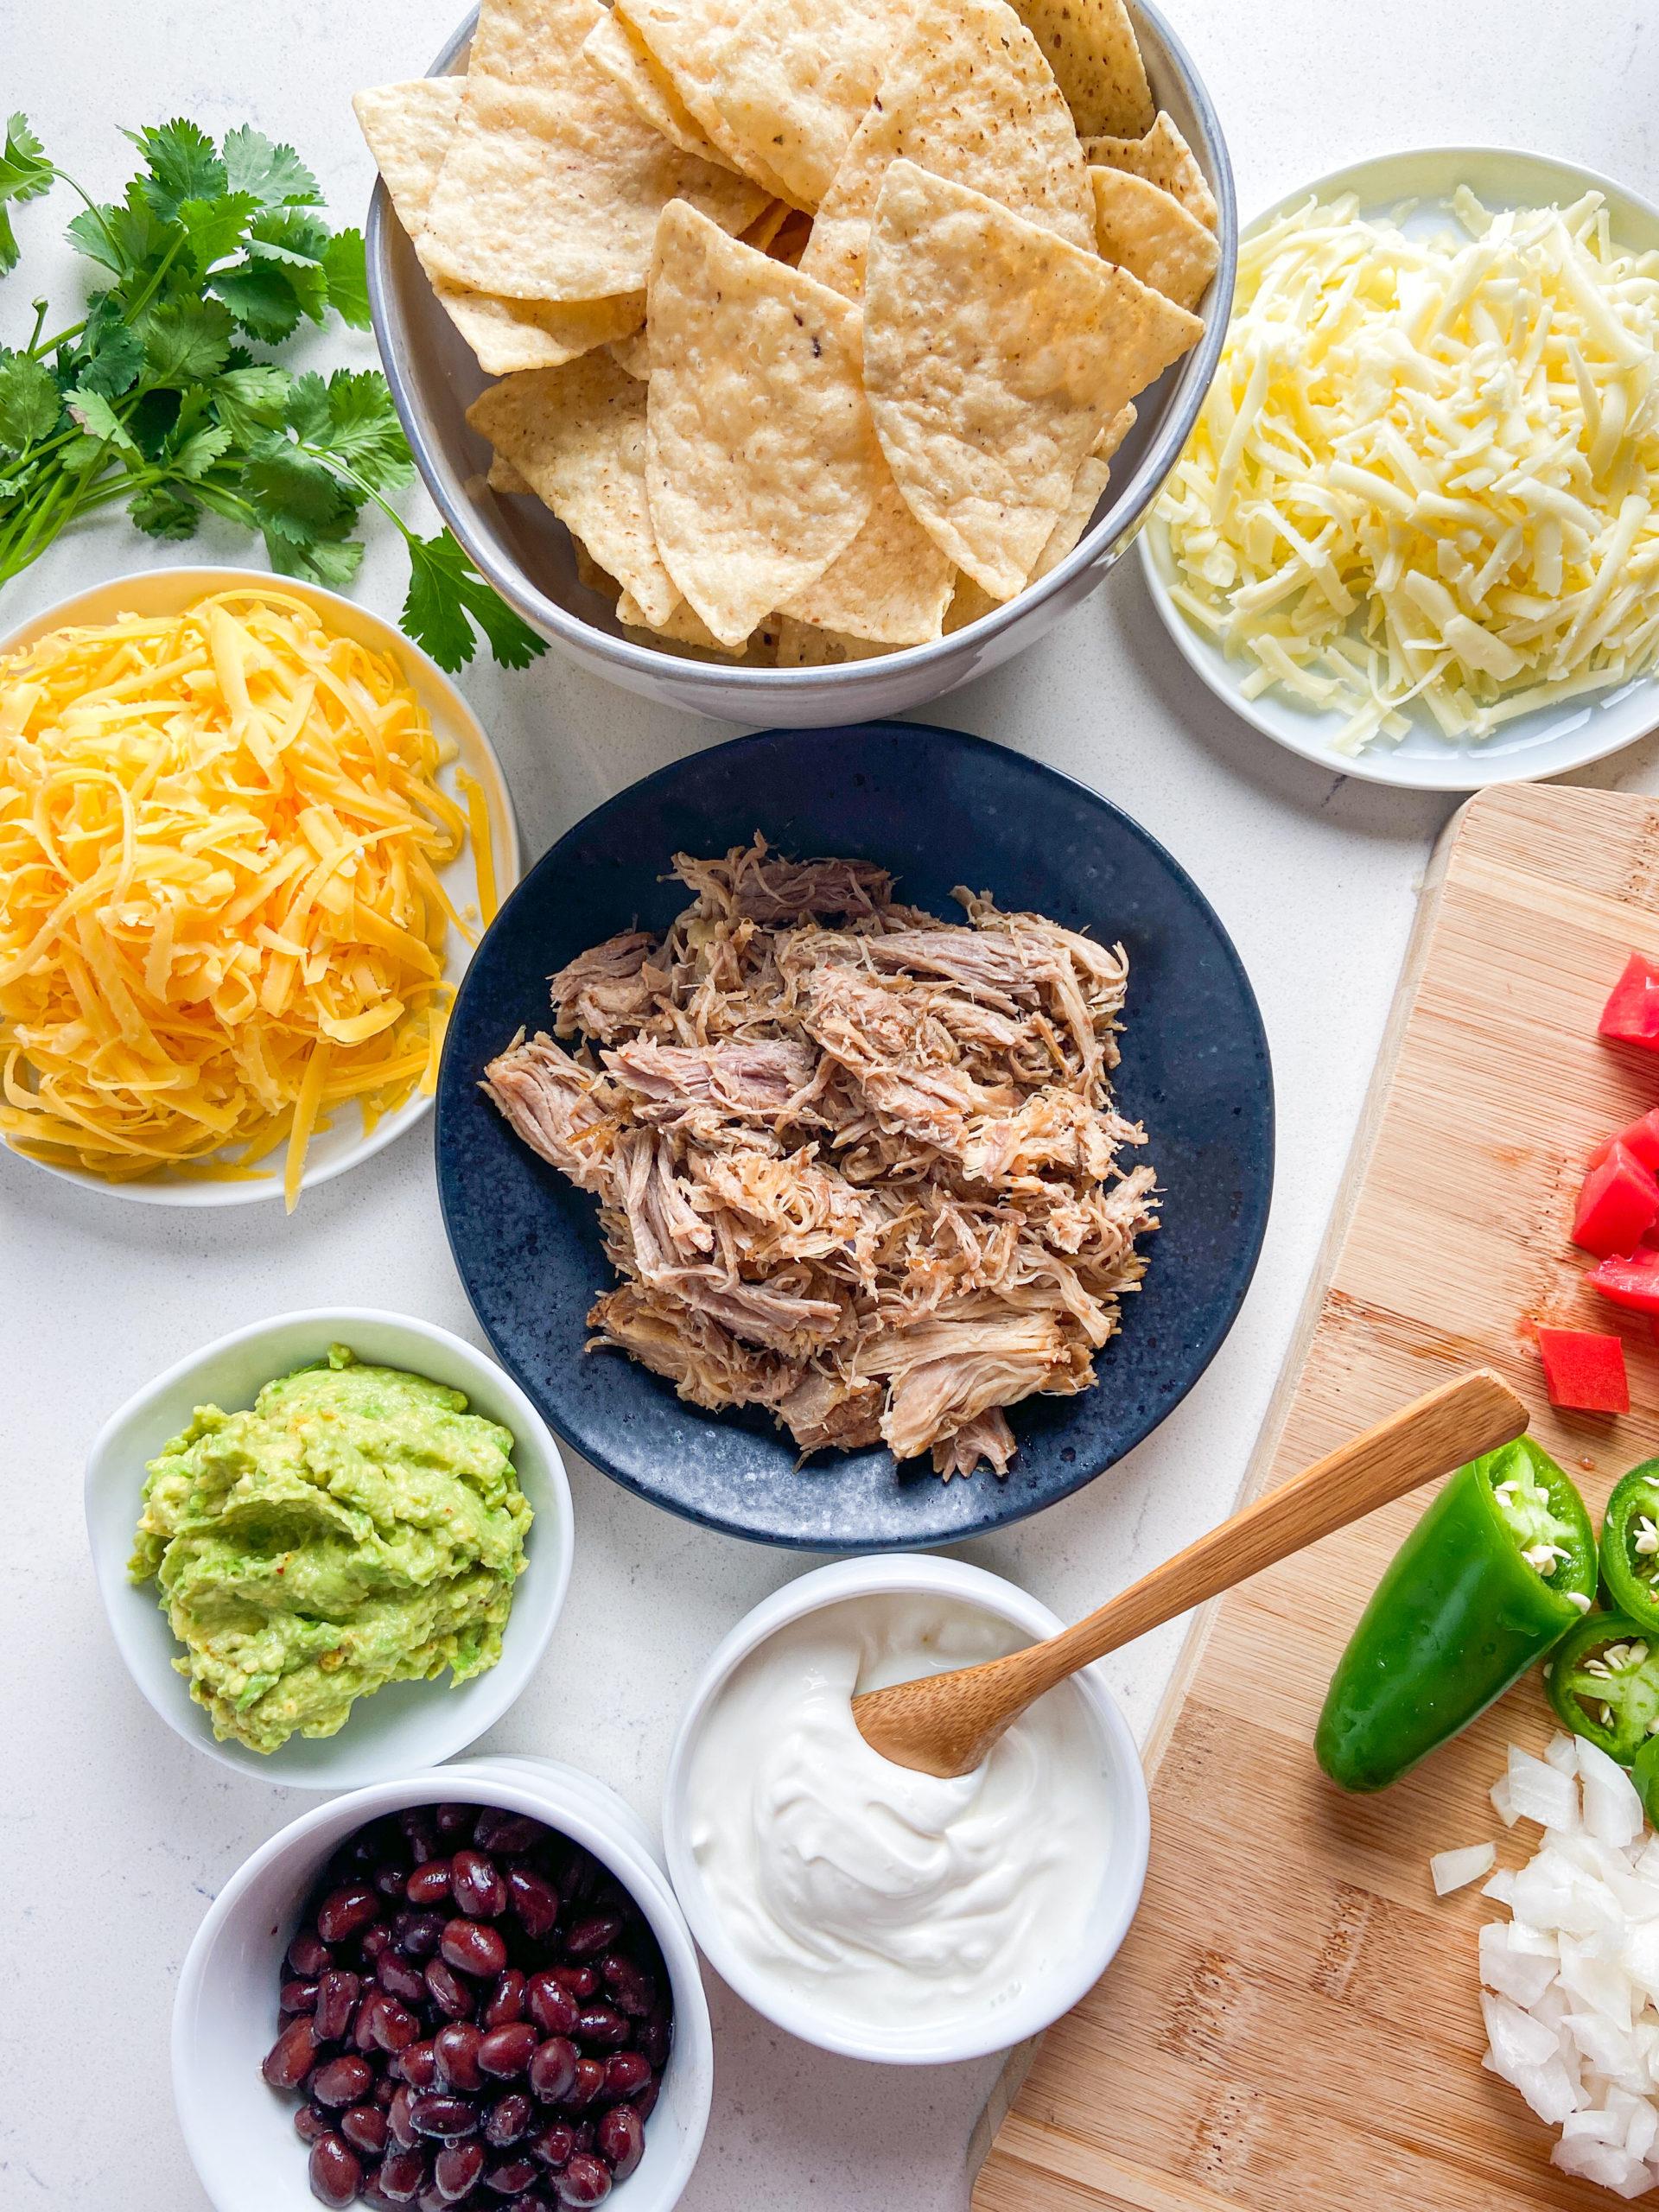 Overhead photo of ingredients  used to make pulled pork nachos.